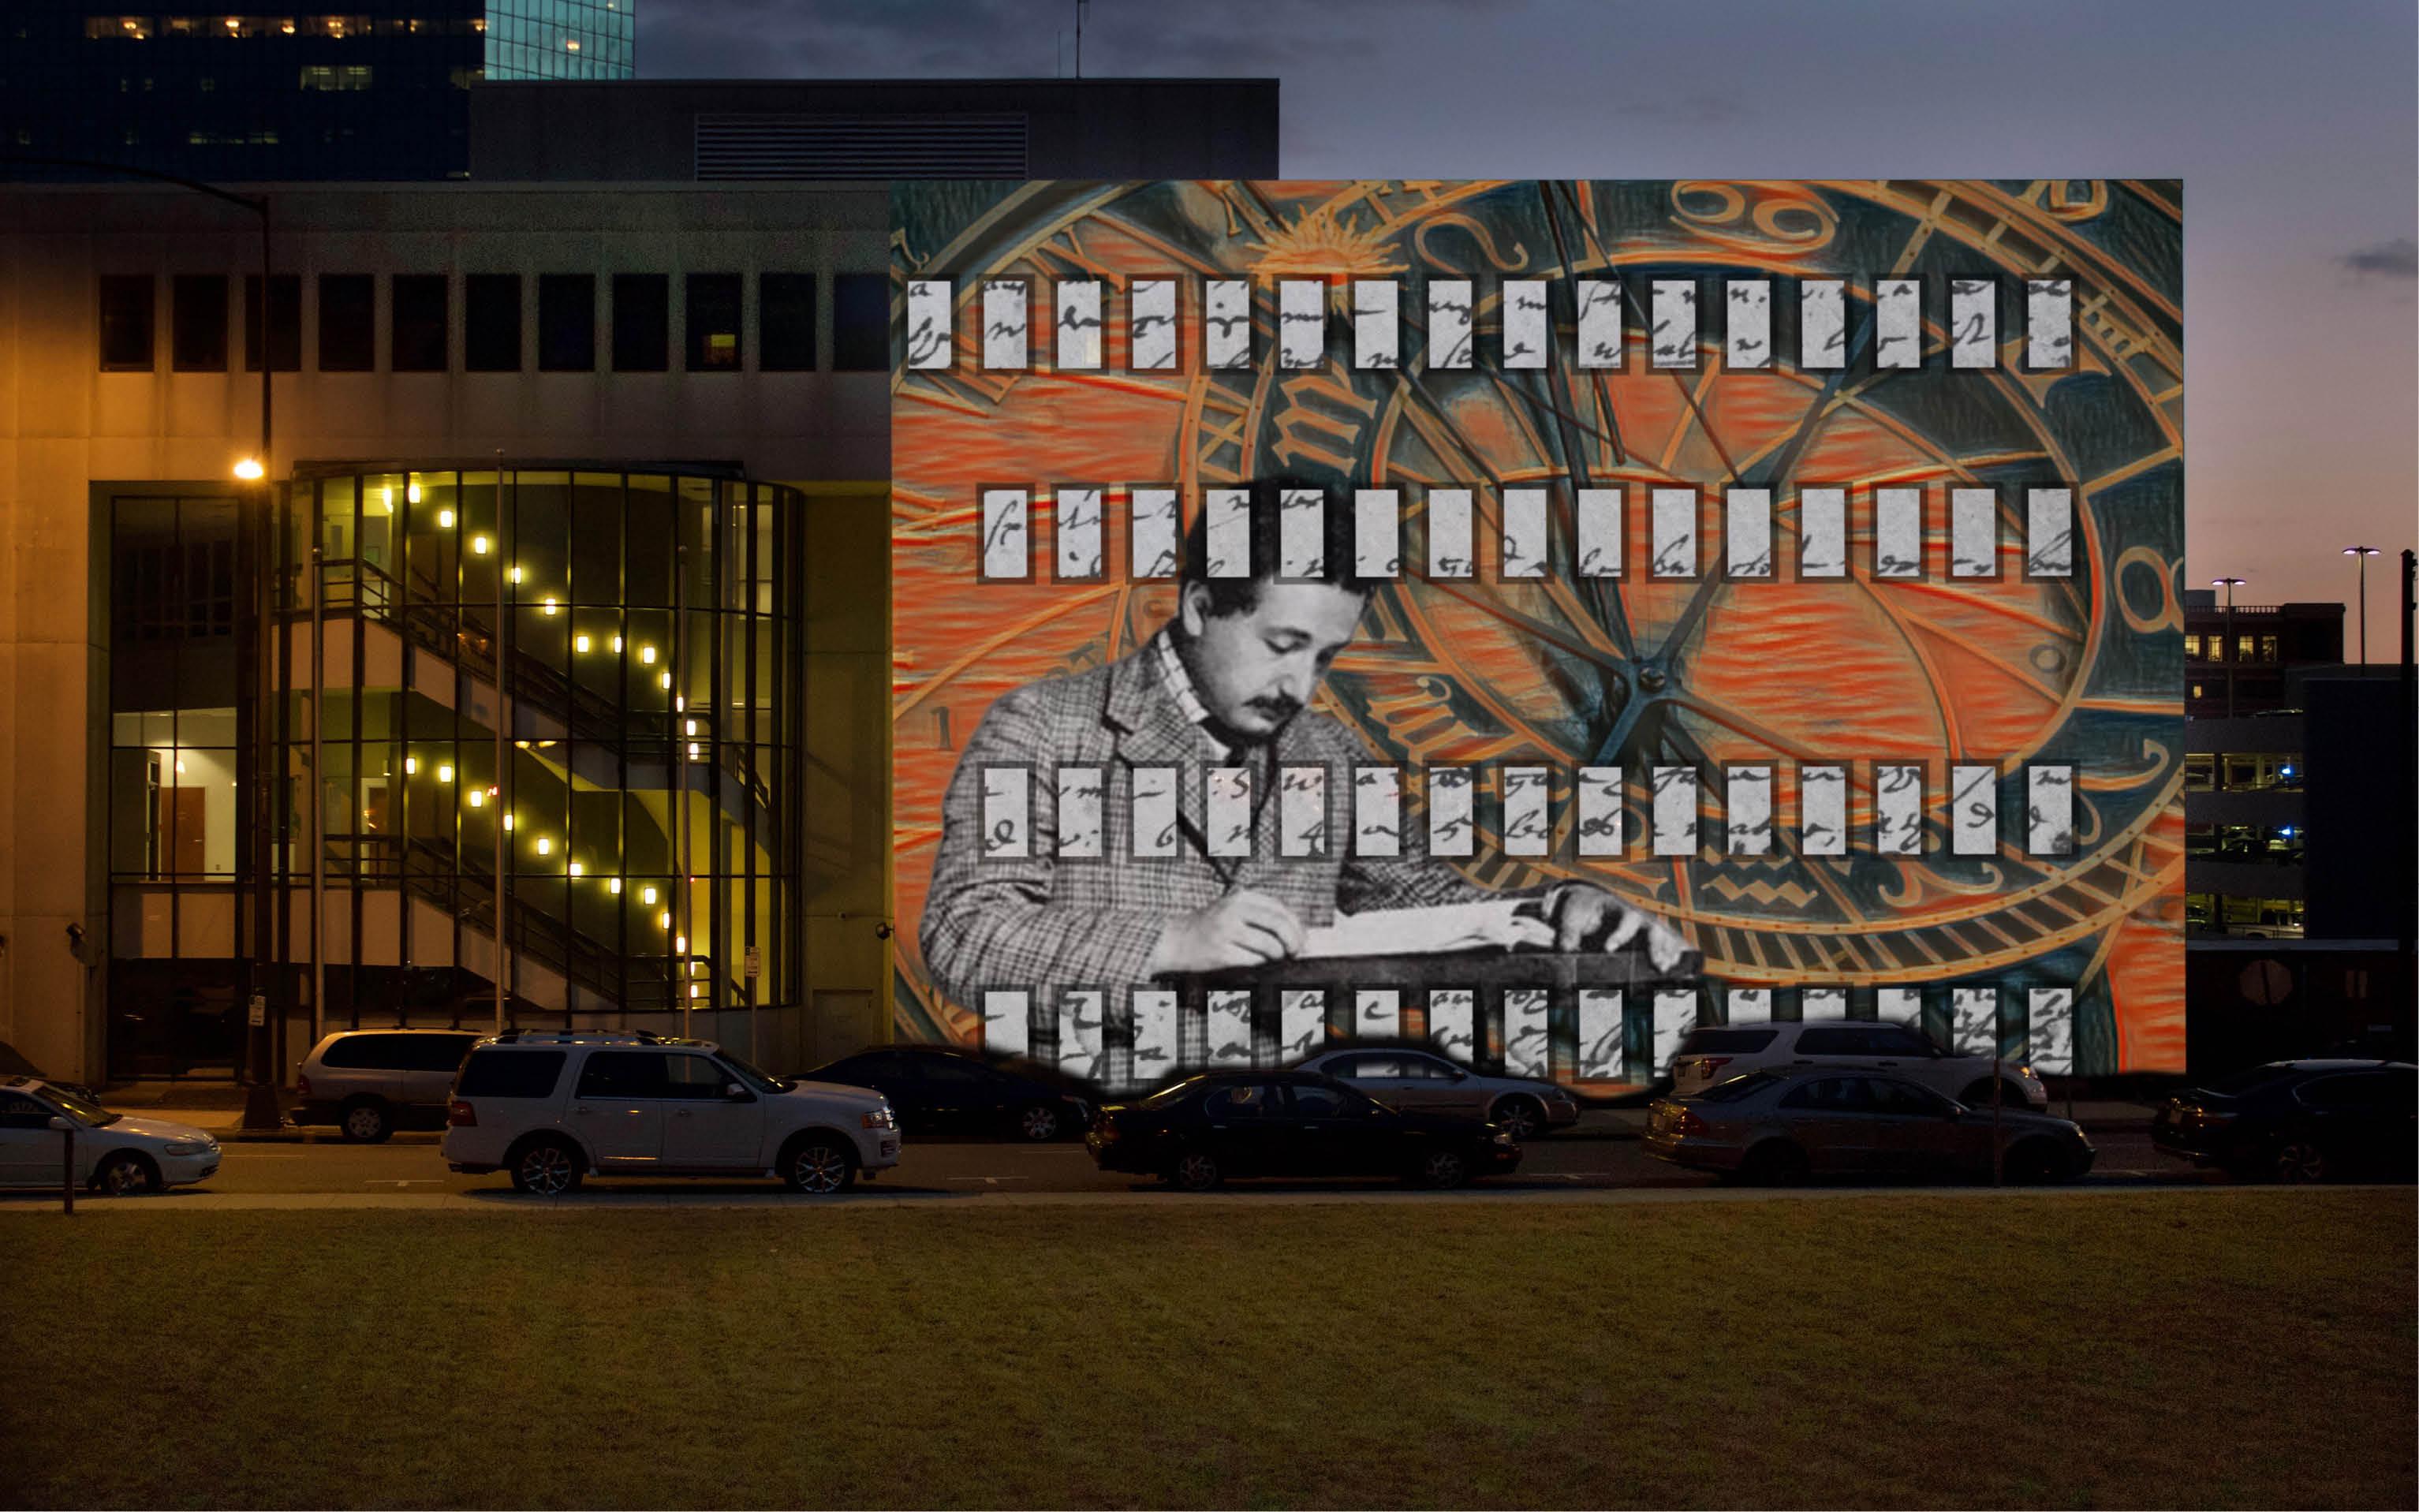 Winston-Salem Light project explores